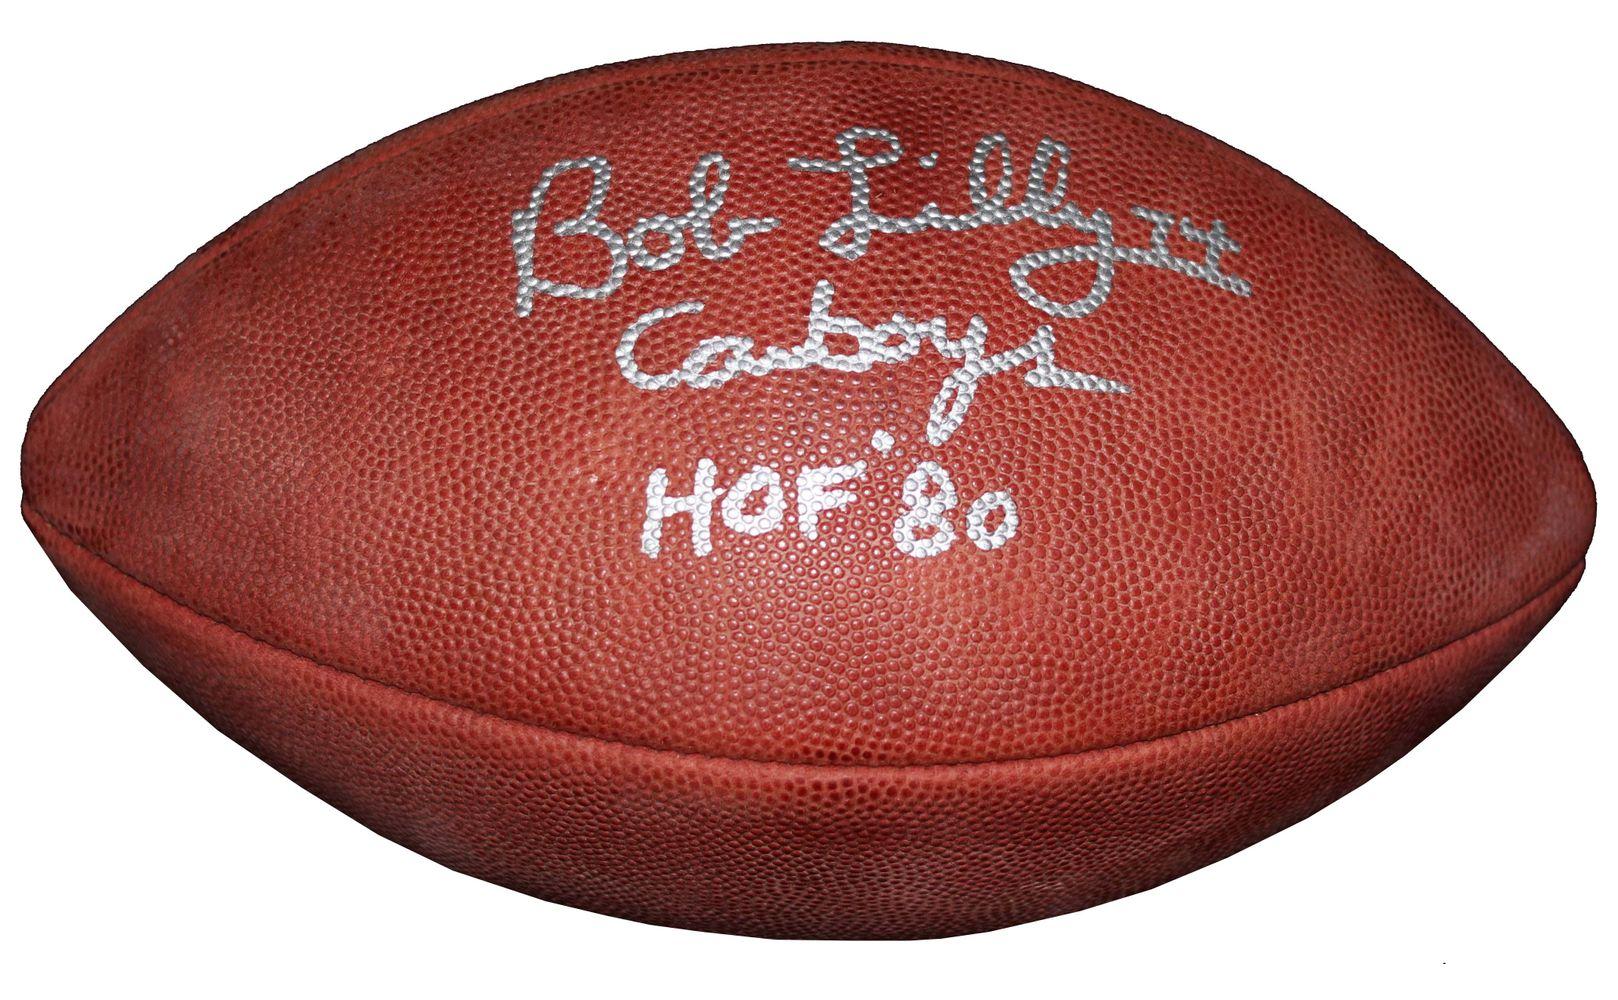 quality design 1f283 0853c Bob Lilly | PSA AutographFacts™